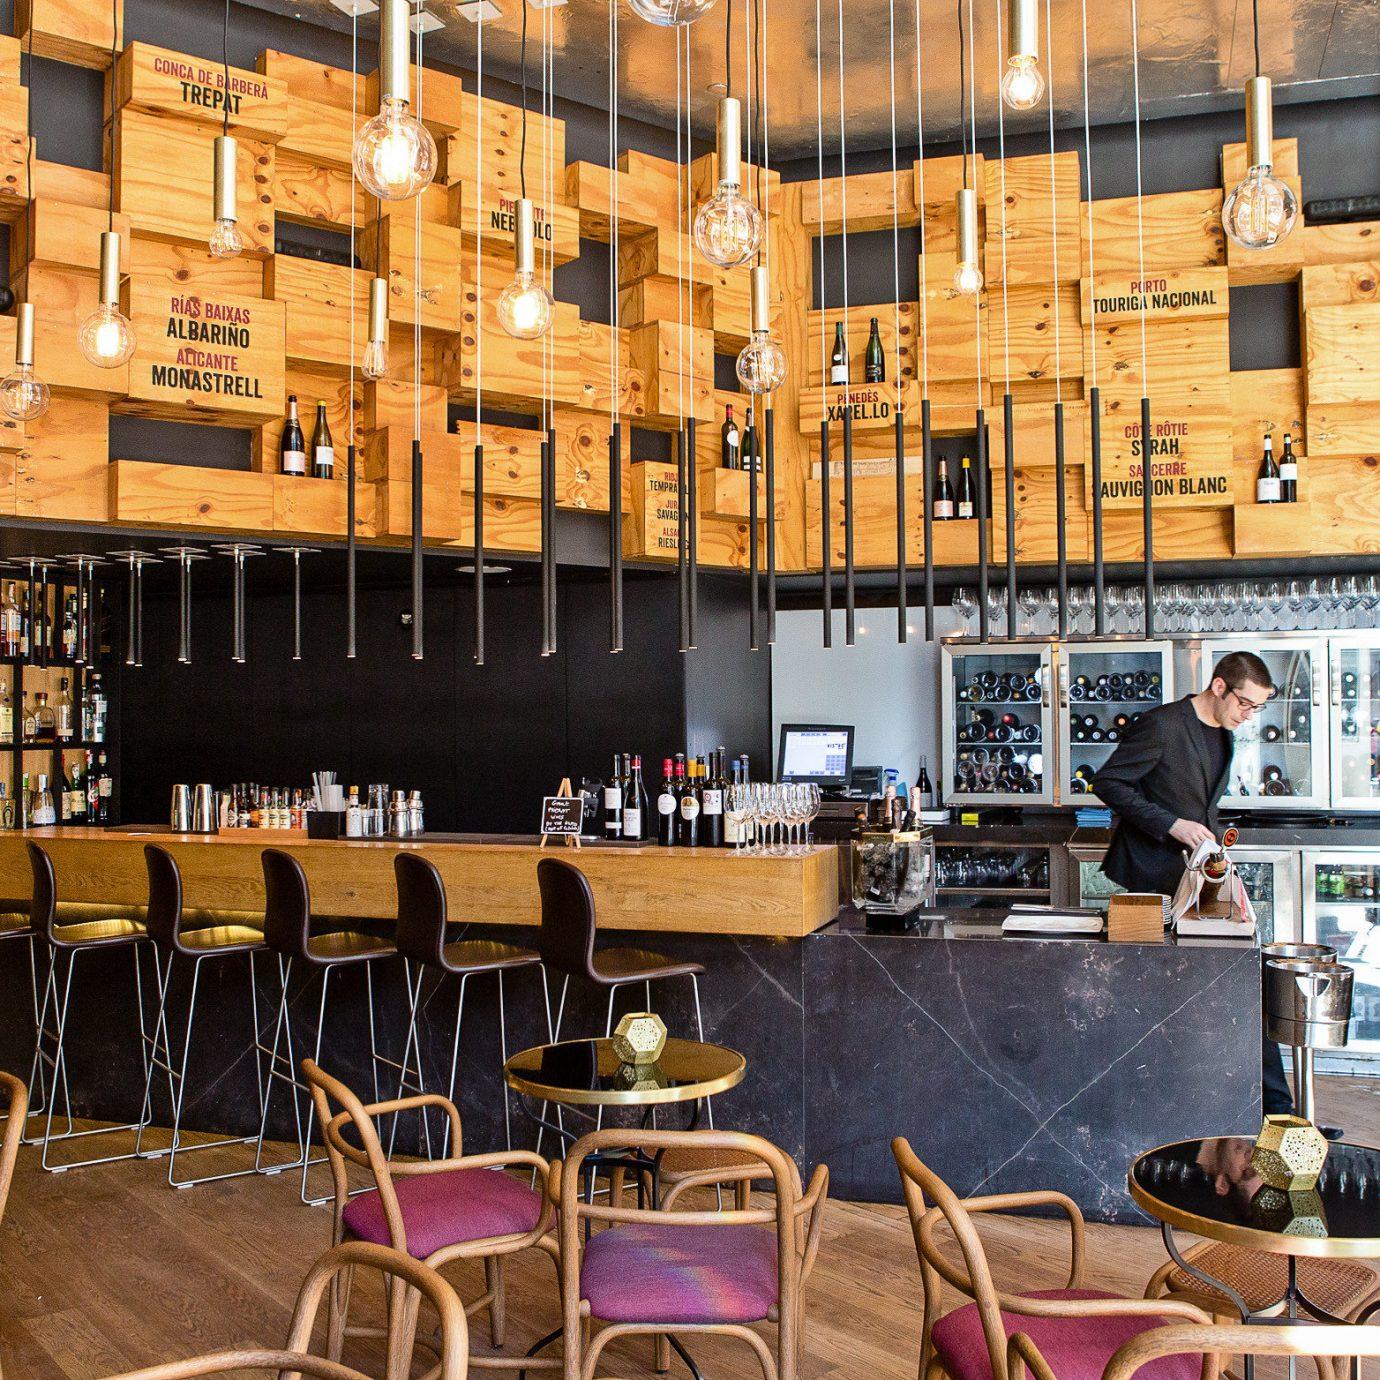 restaurant café coffeehouse Bar liquor store Lobby